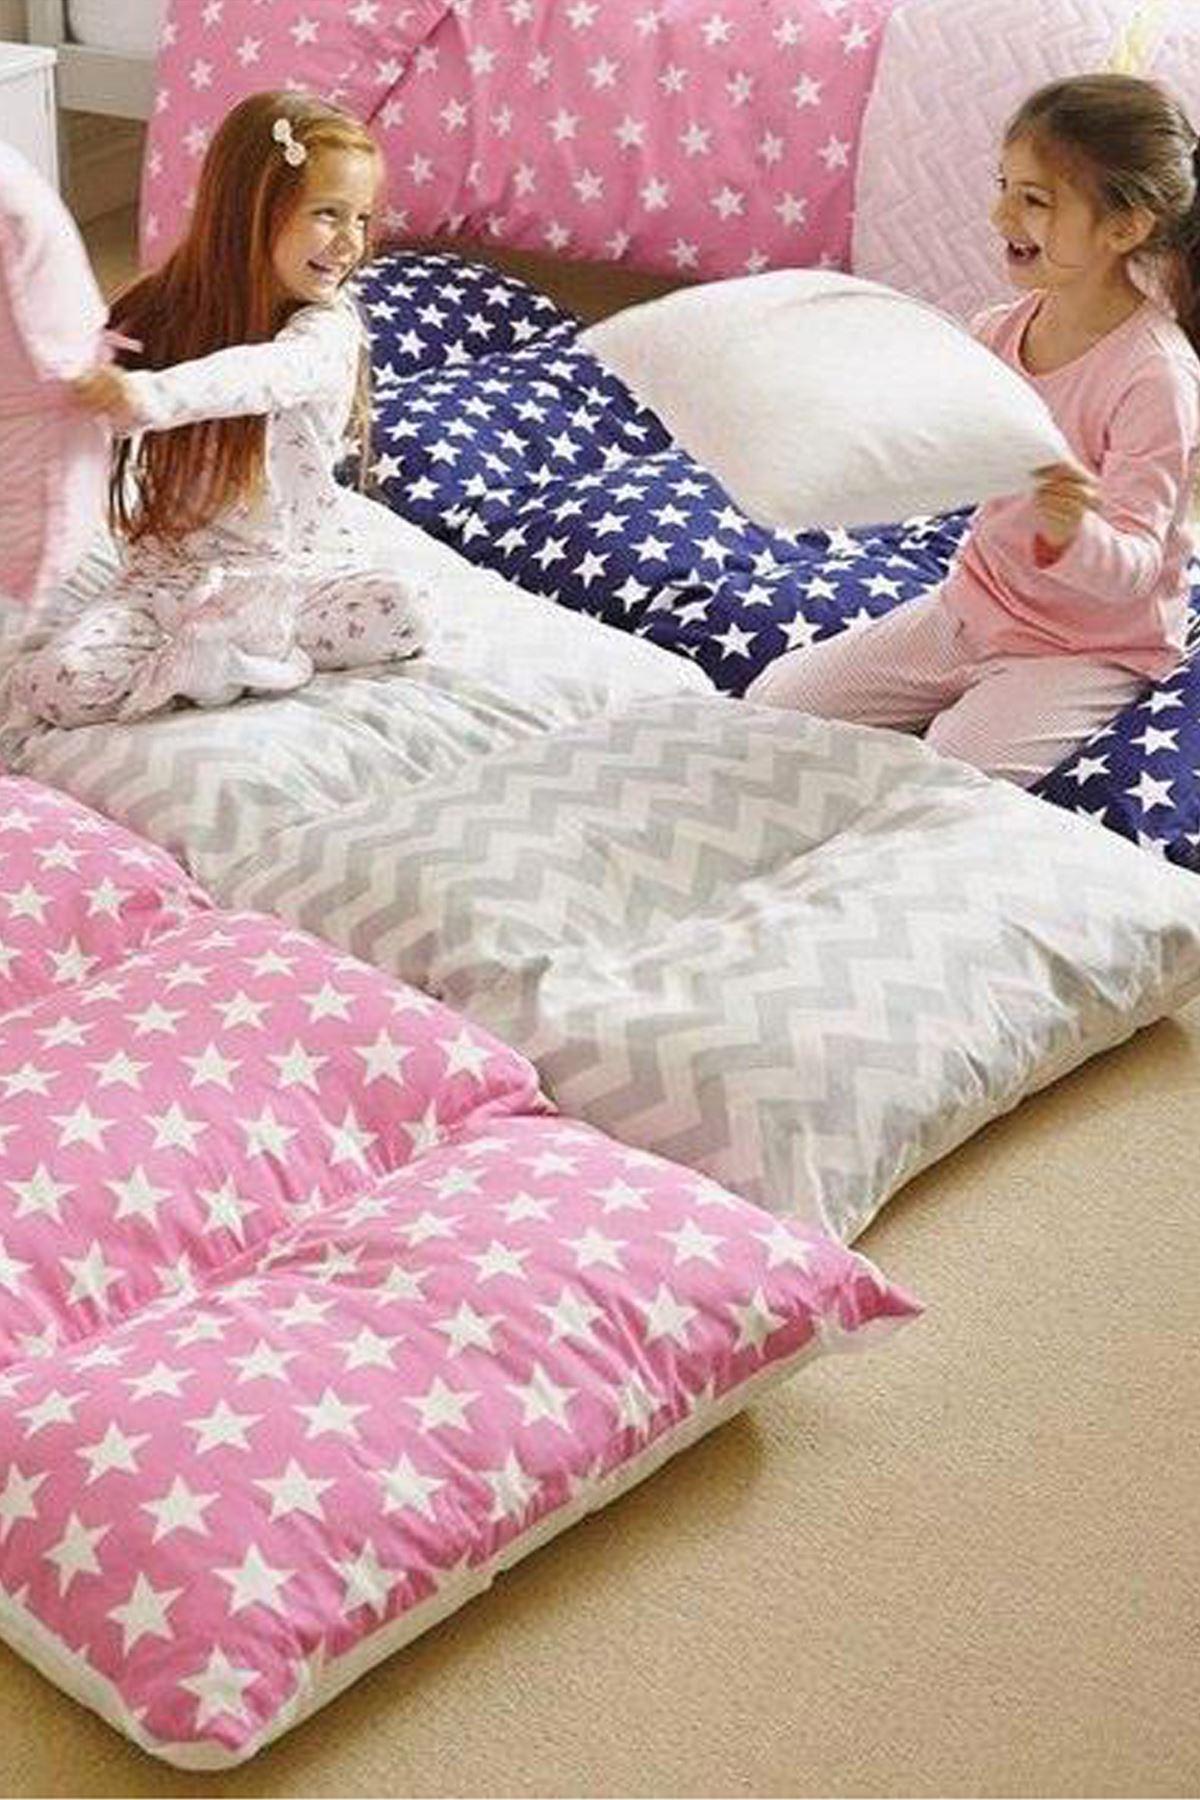 Pink Bundera Pouf Foldable Floor Cushion Pillow Kids Baby Floor Bed